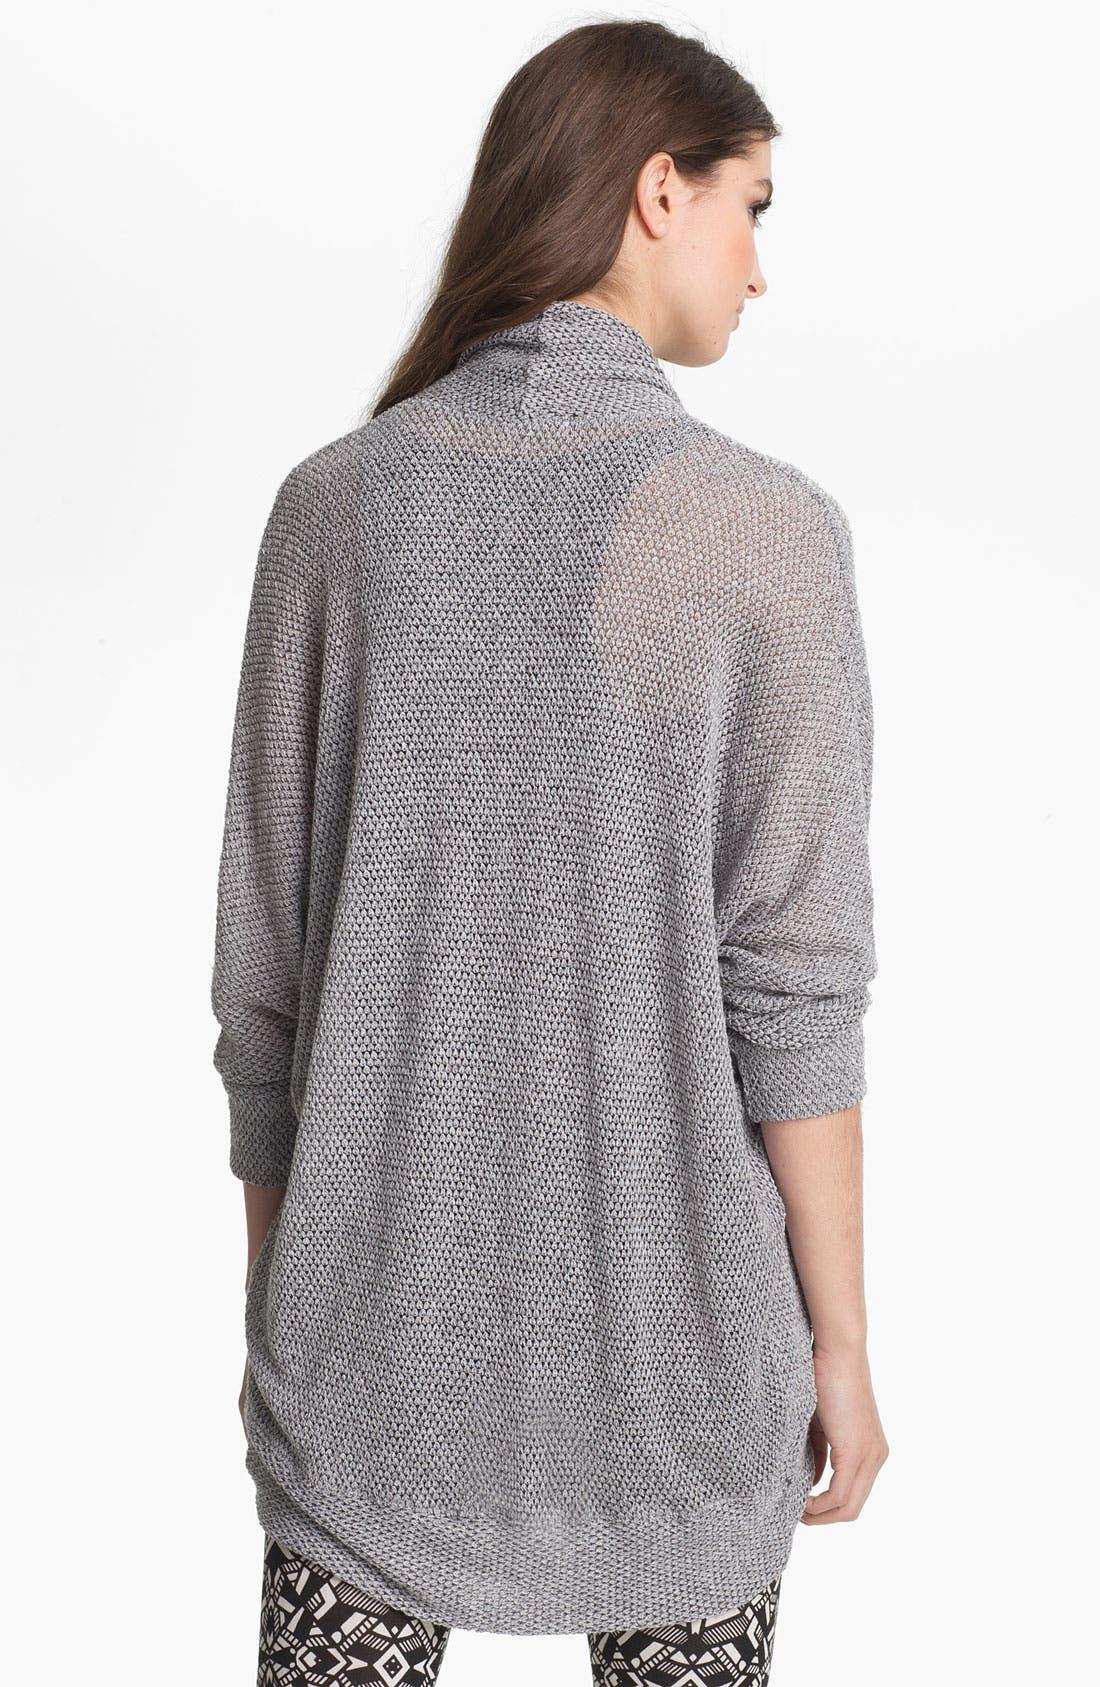 Alternate Image 2  - Painted Threads Oversized Lightweight Knit Cardigan (Juniors)